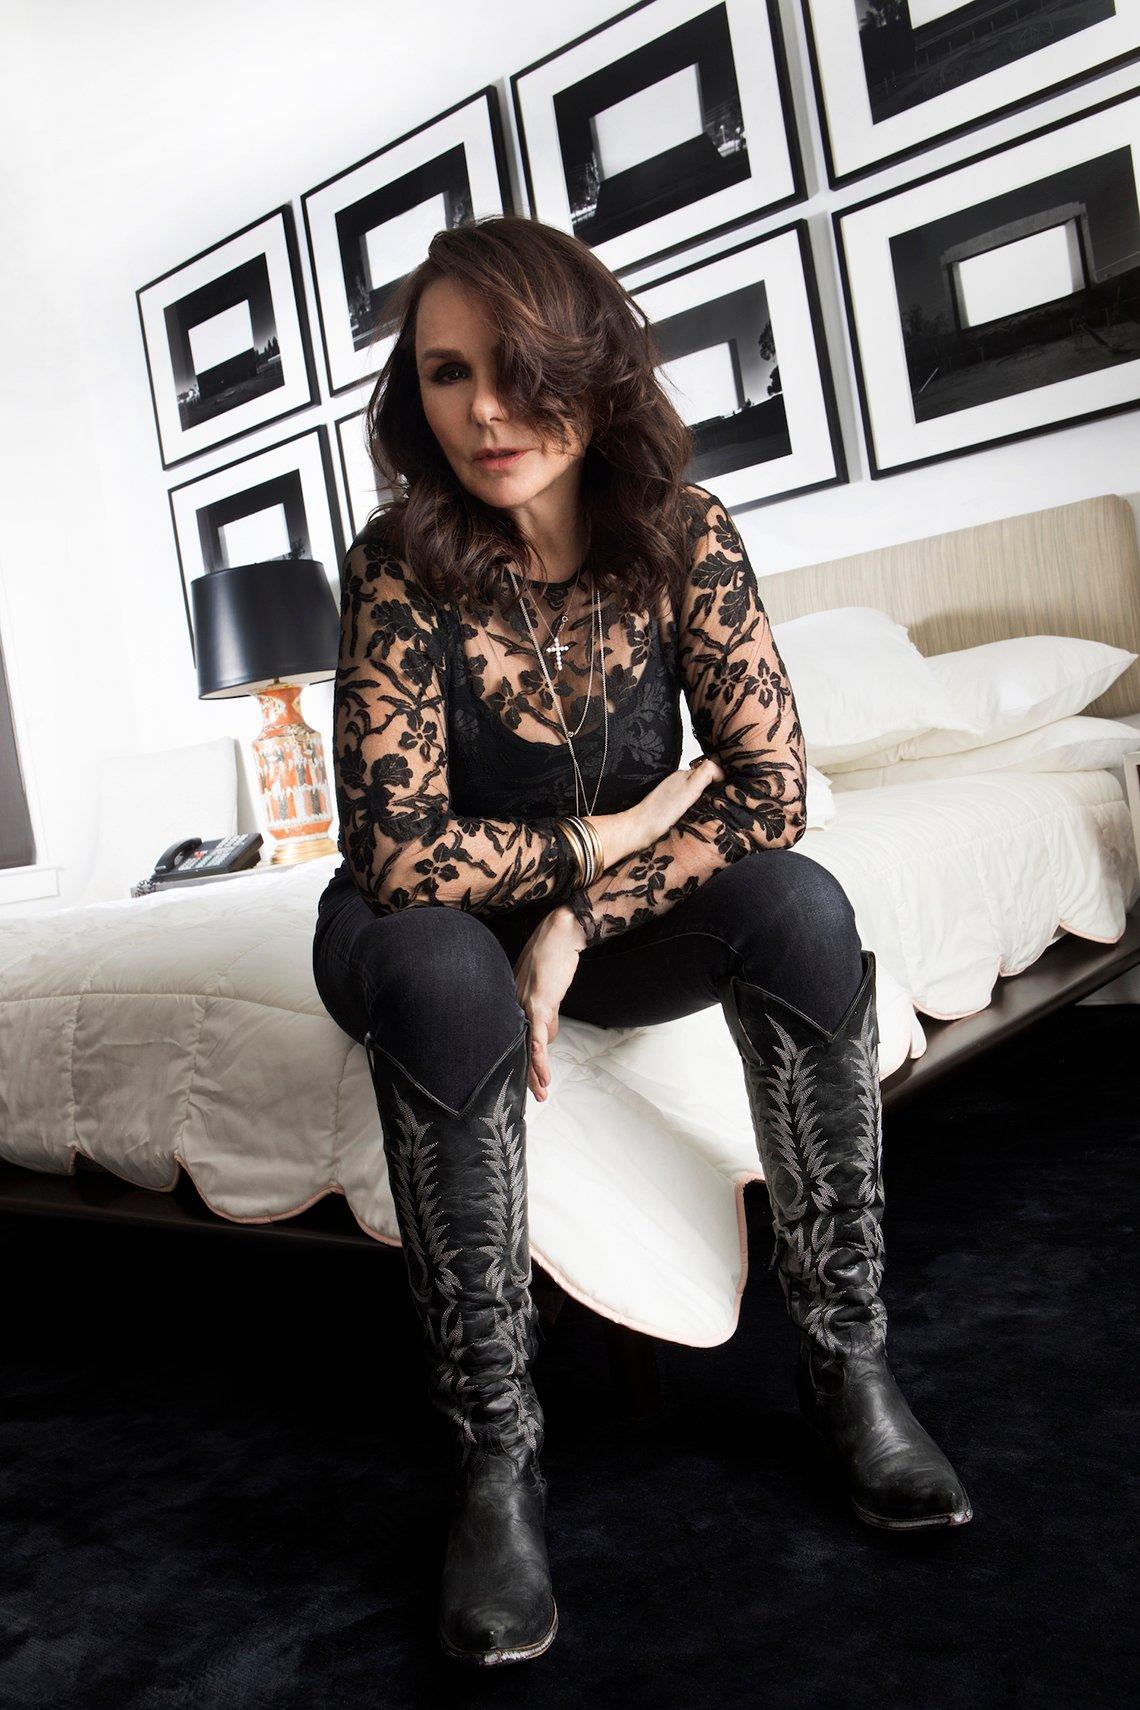 Singer Patty Smyth sitting on a bed